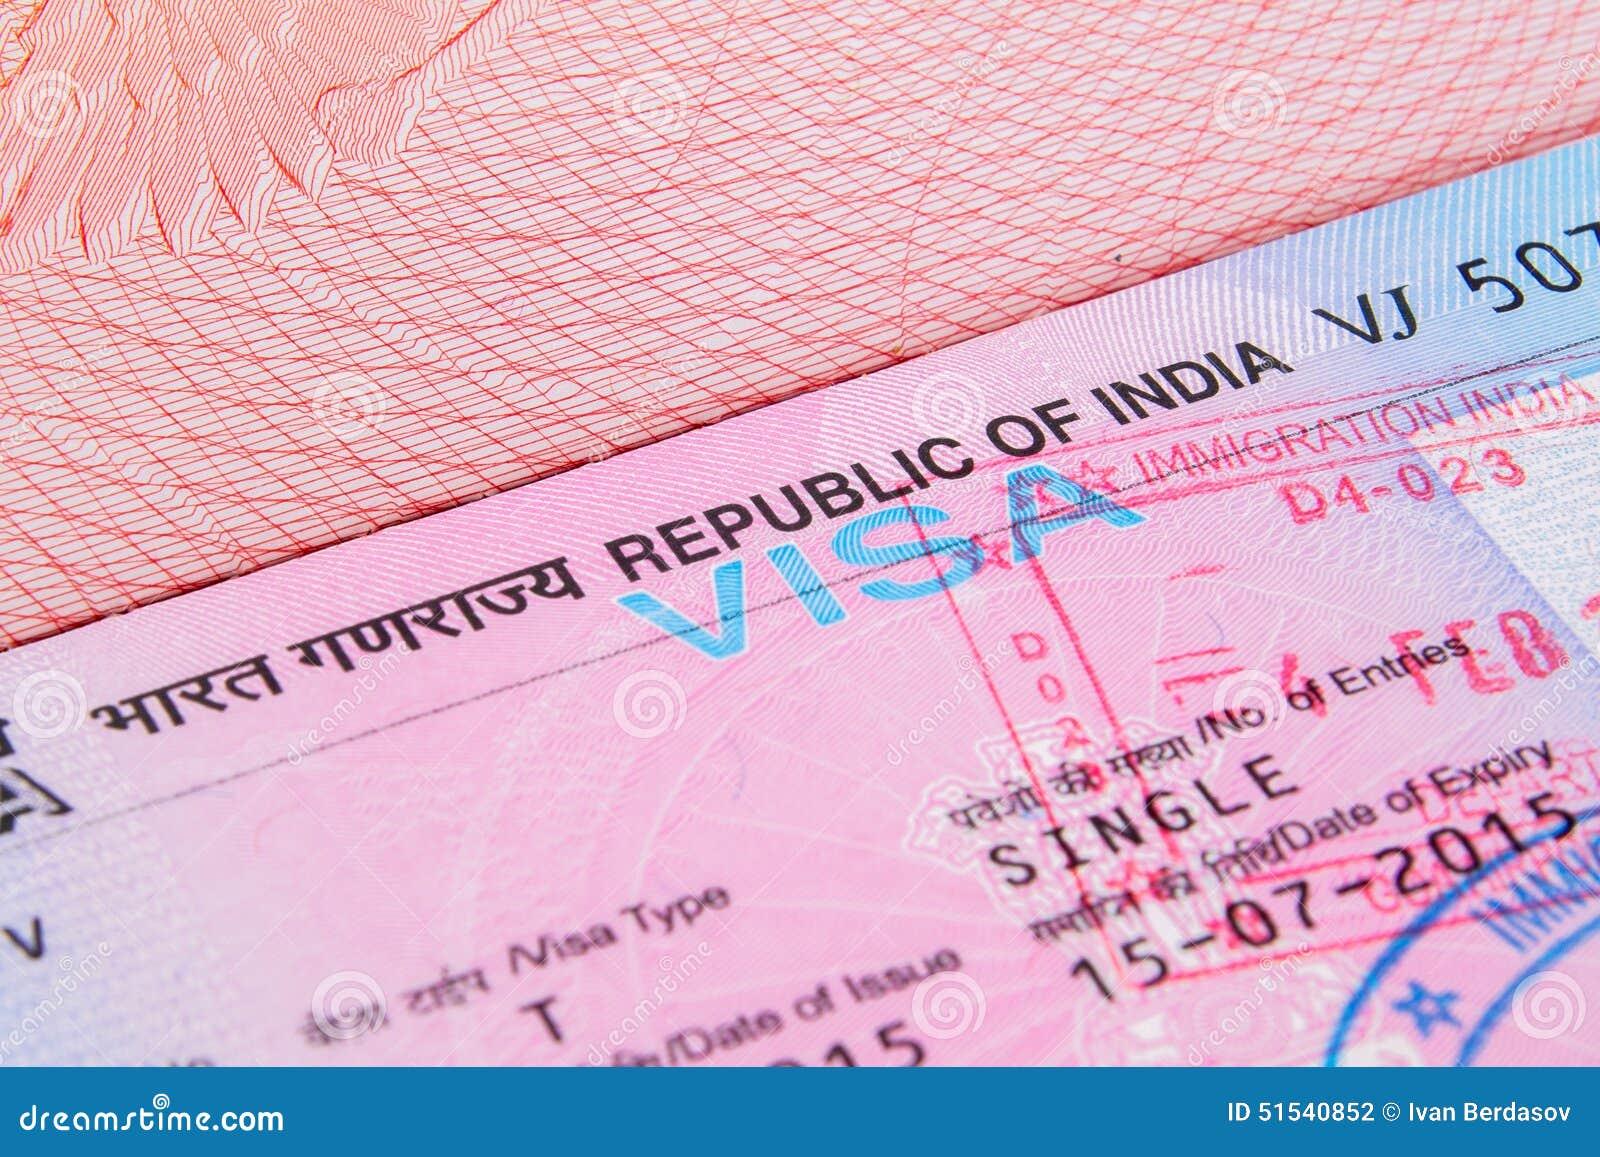 nara visa hindu singles Statistical atlas: the demographic statistical atlas of the united states.